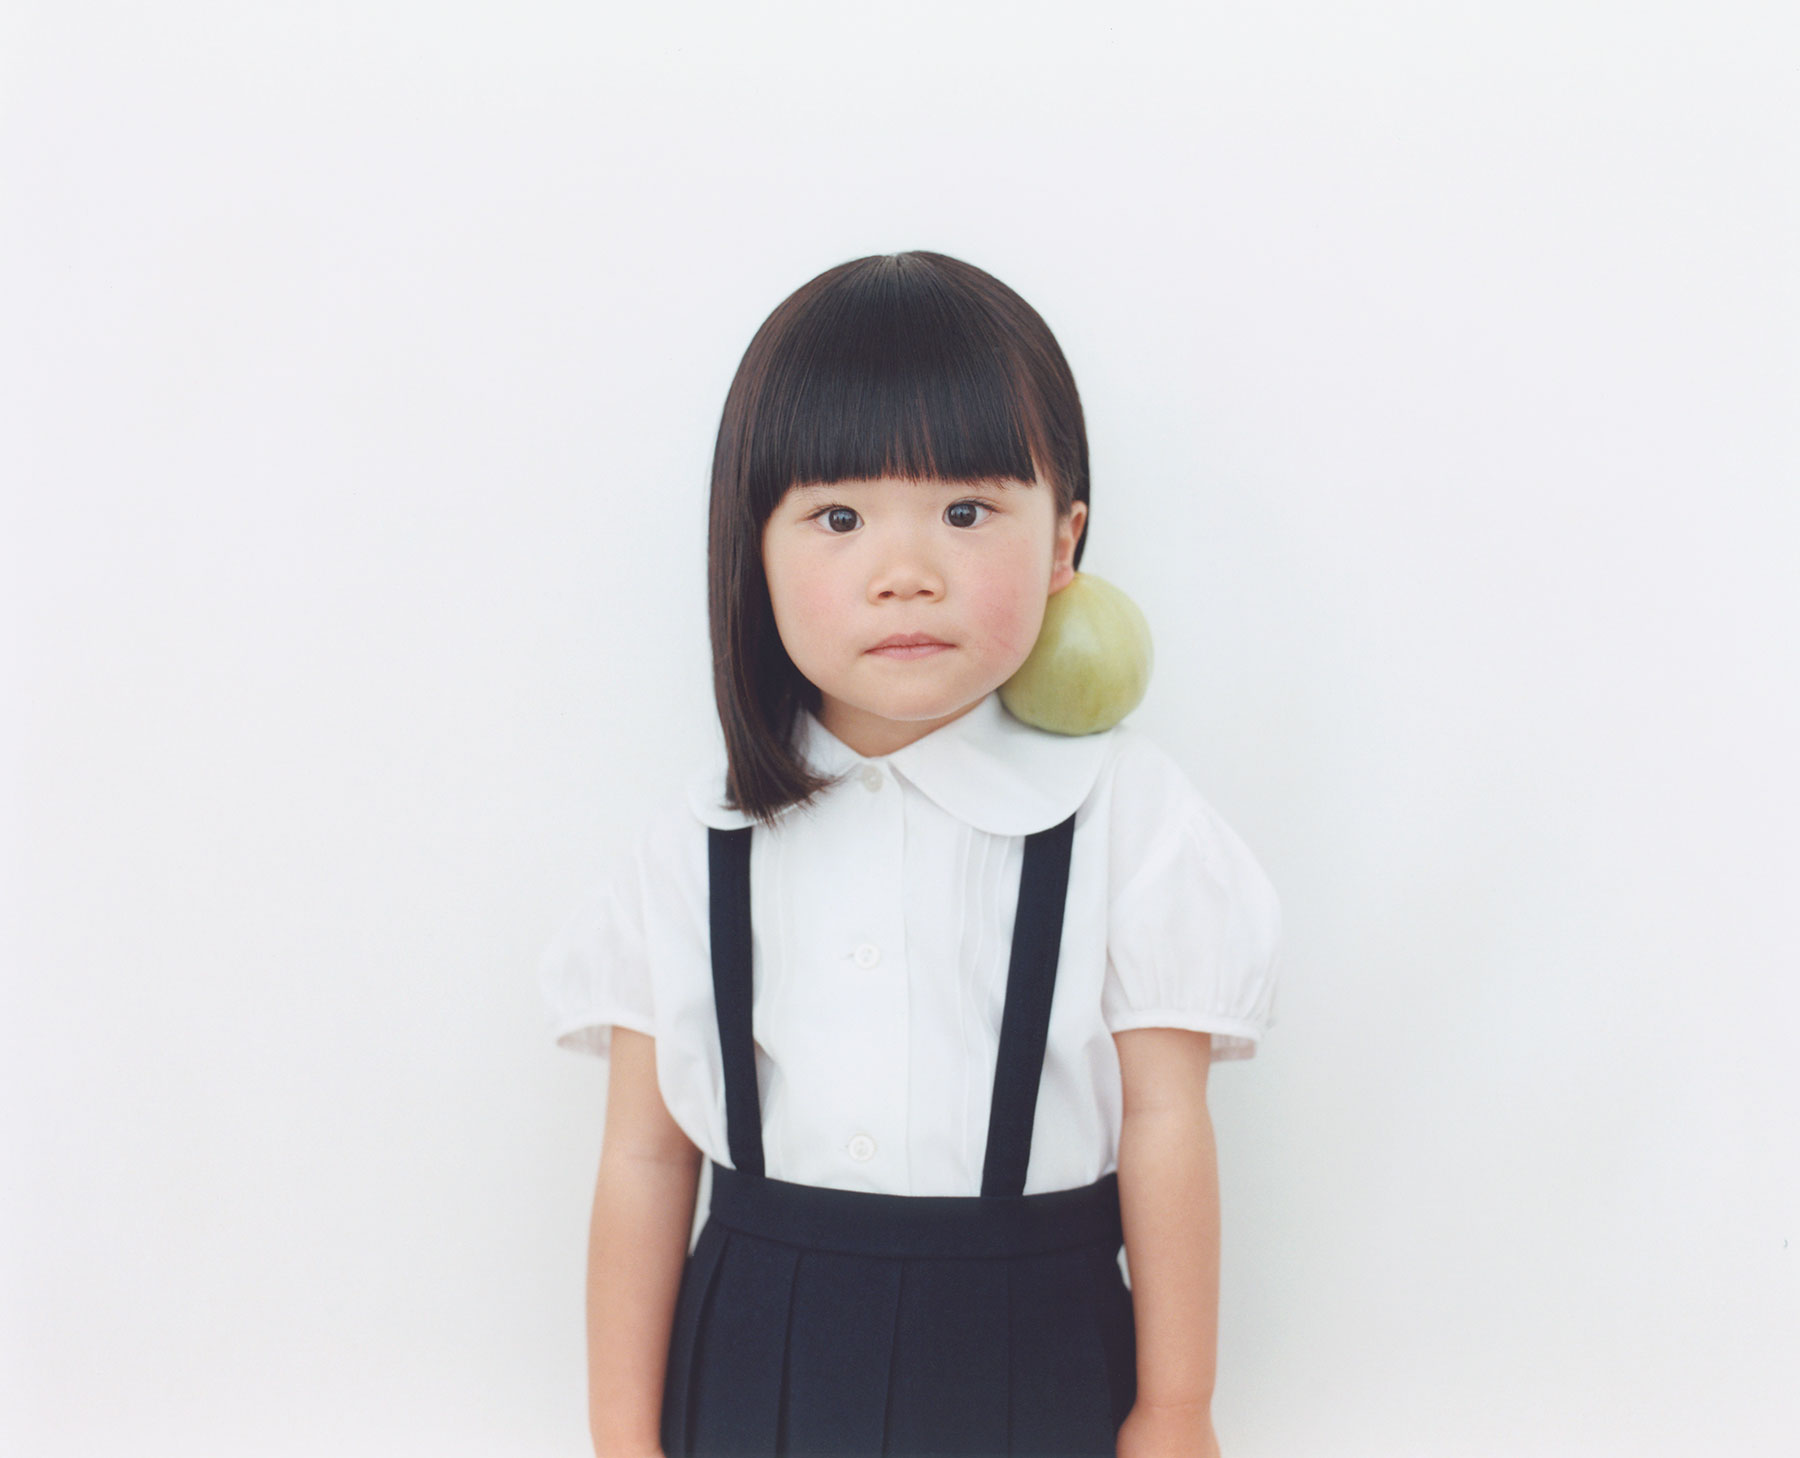 Osamu Yokonami,  1000 Children: Green Tomato No. 54 , 2010-2013  Digital pigment print, 895 x 1105 mm (approx. 35 x 43.5 in), edition of 5; 146 x 168 mm (approx. 5.75 x 6.6 in), edition of 10   Inquire